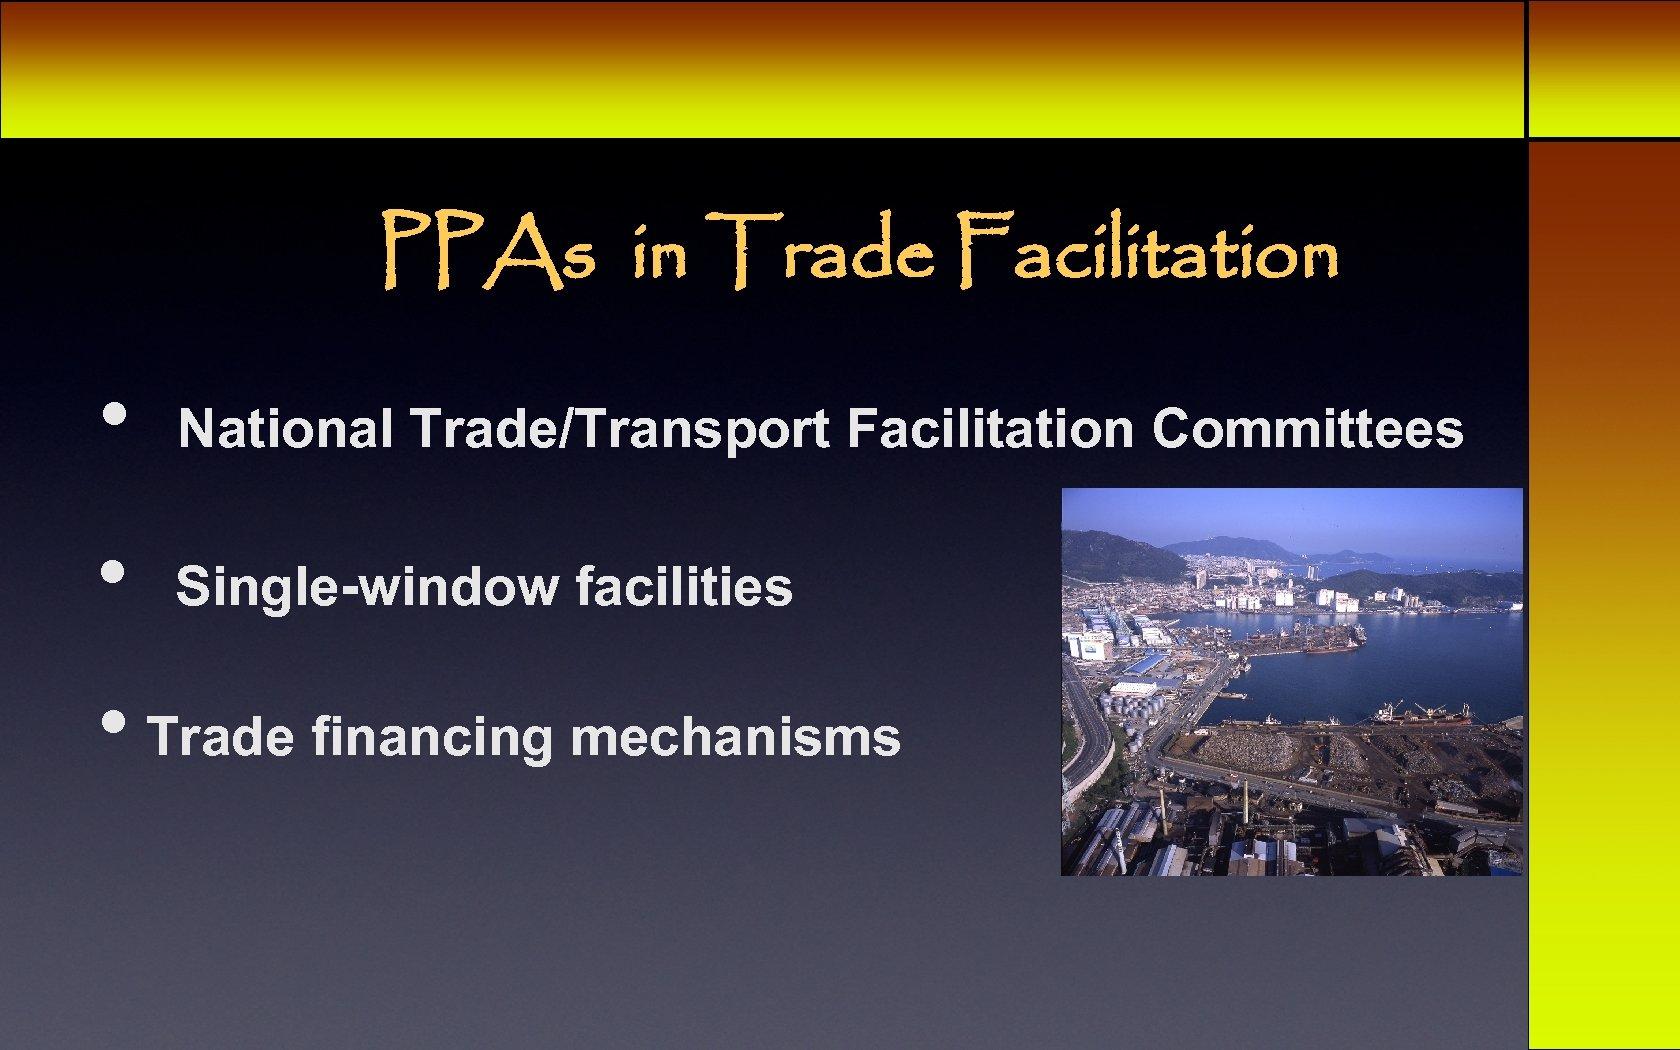 PPAs in Trade Facilitation • National Trade/Transport Facilitation Committees • Single-window facilities • Trade